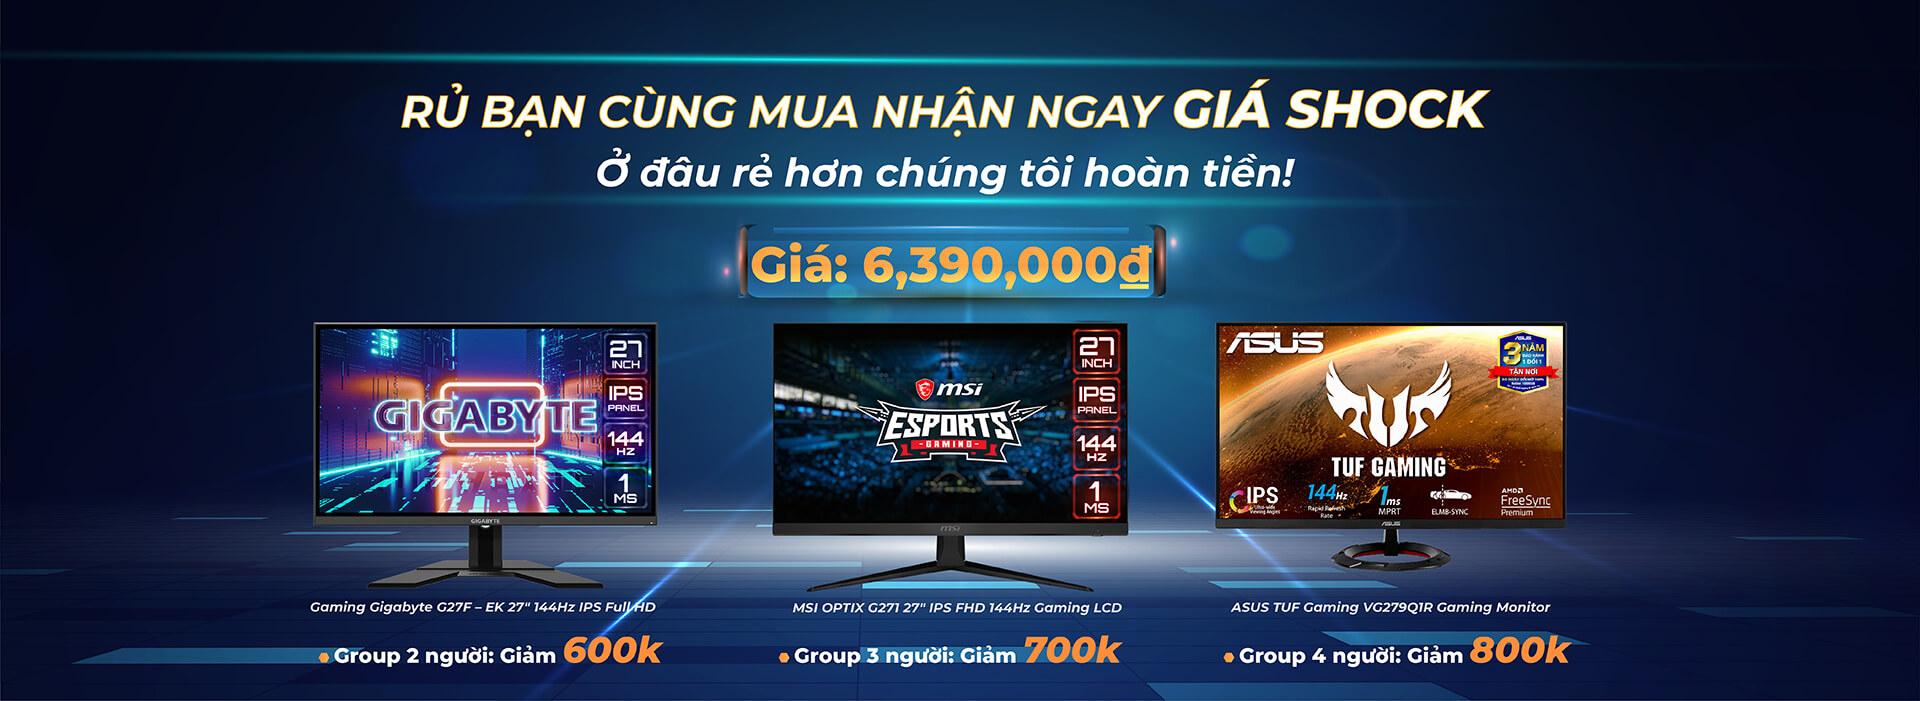 Banner Post Mua Chung Lcd Sale Off